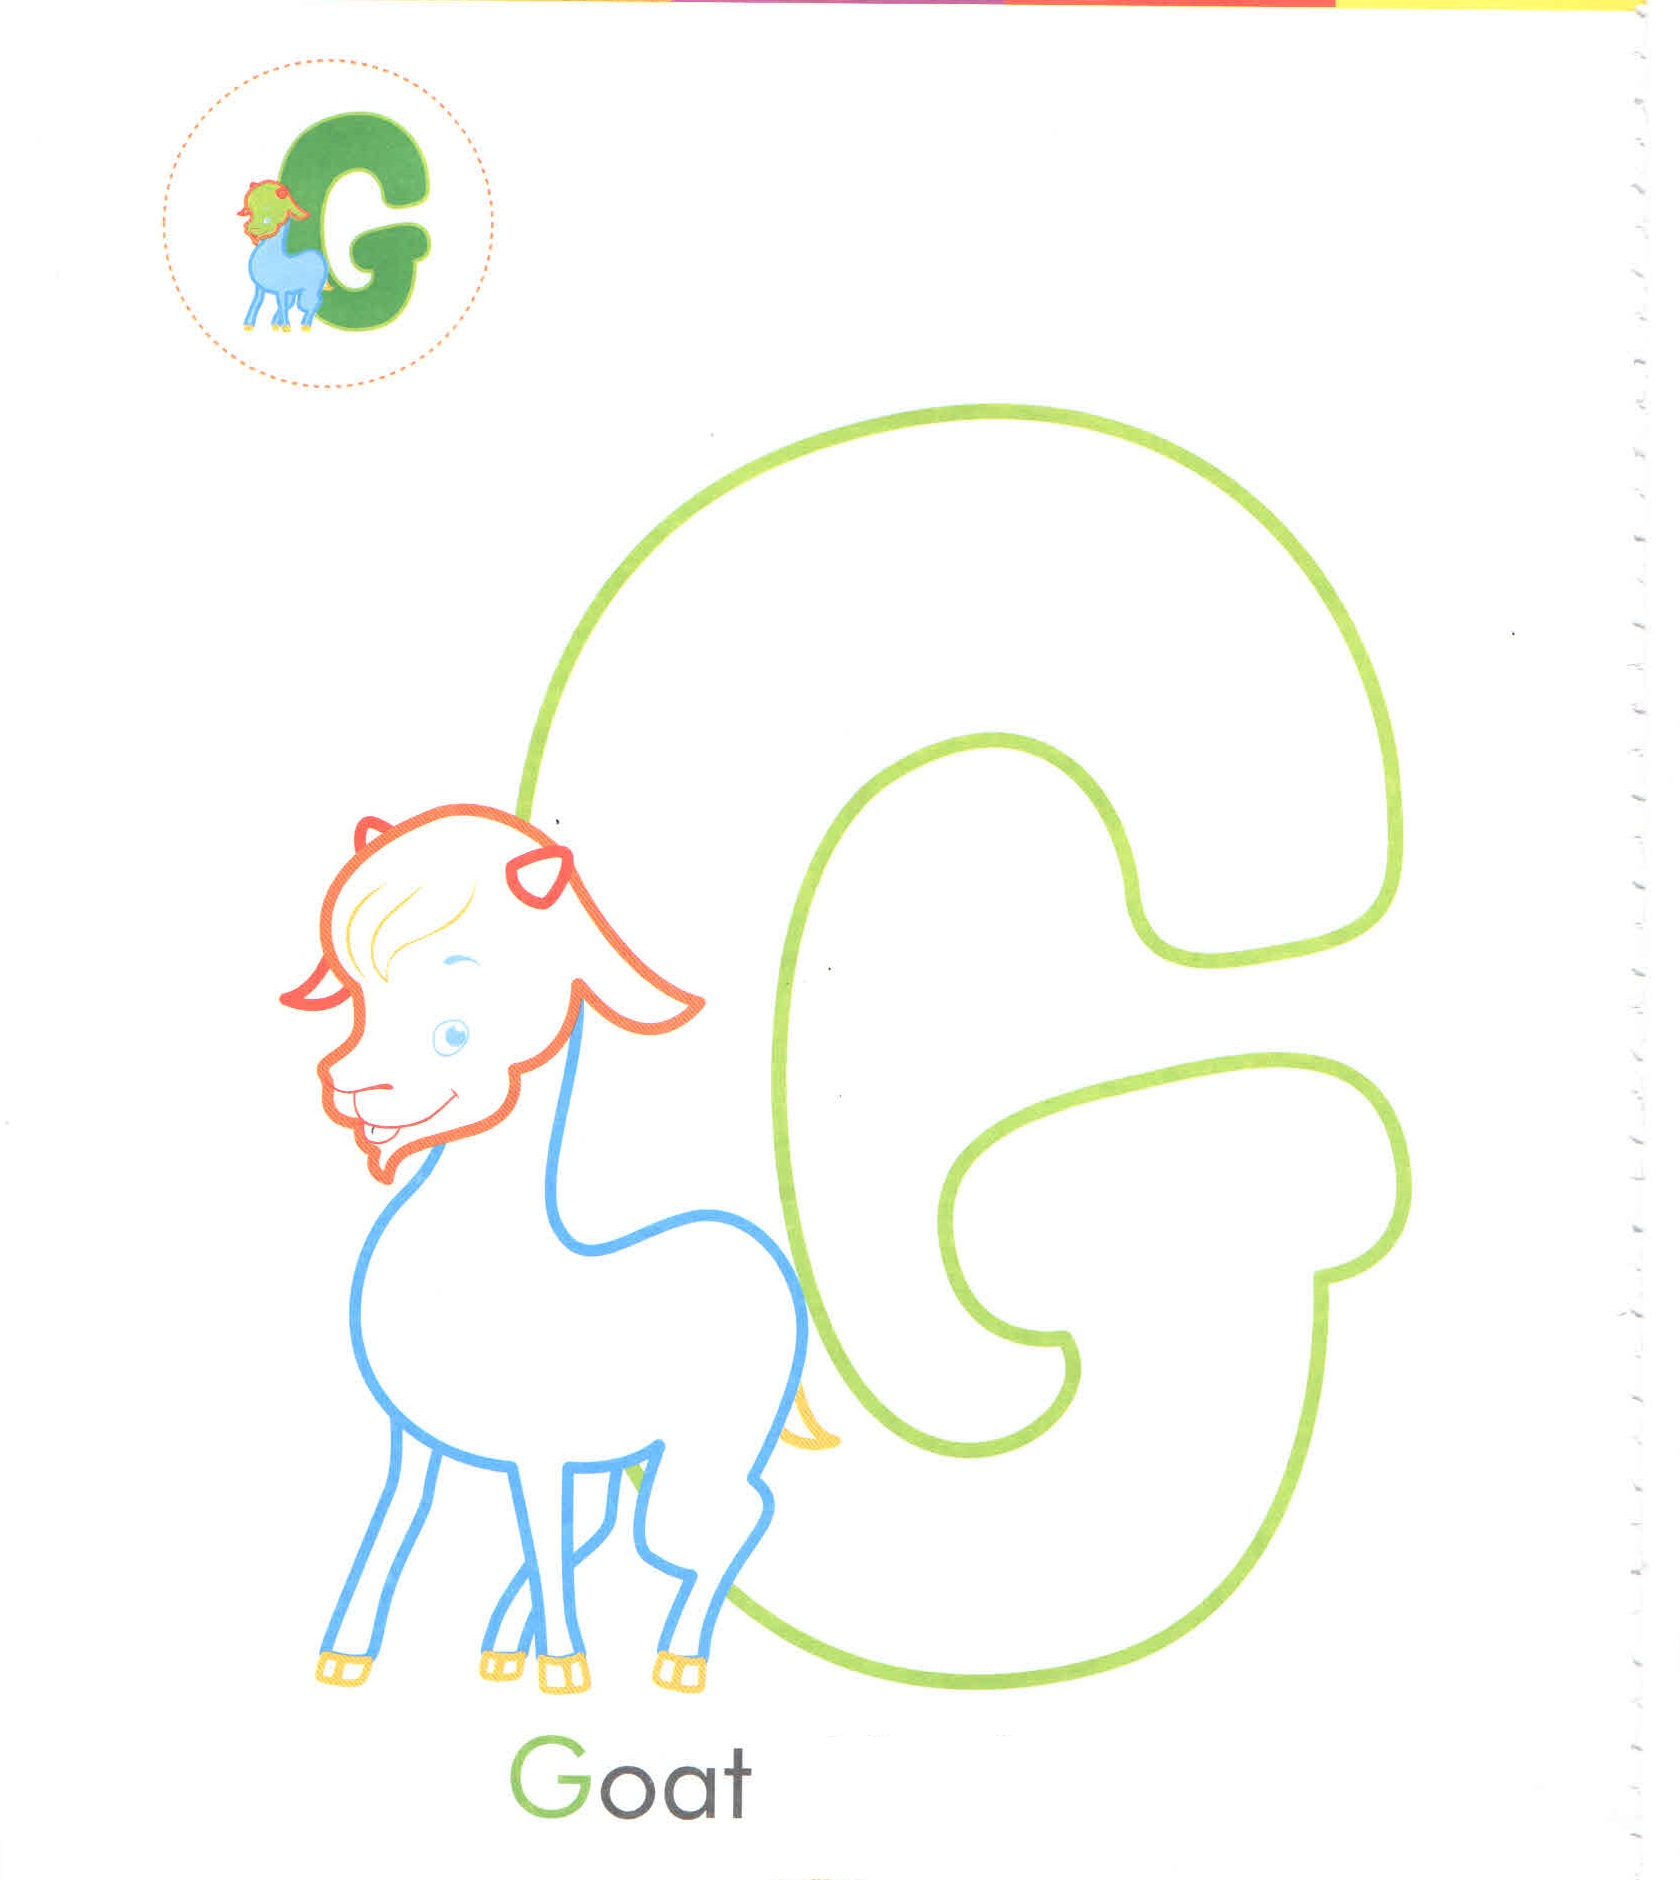 Alphabet Letter G Goat Coloring Page For Preschool